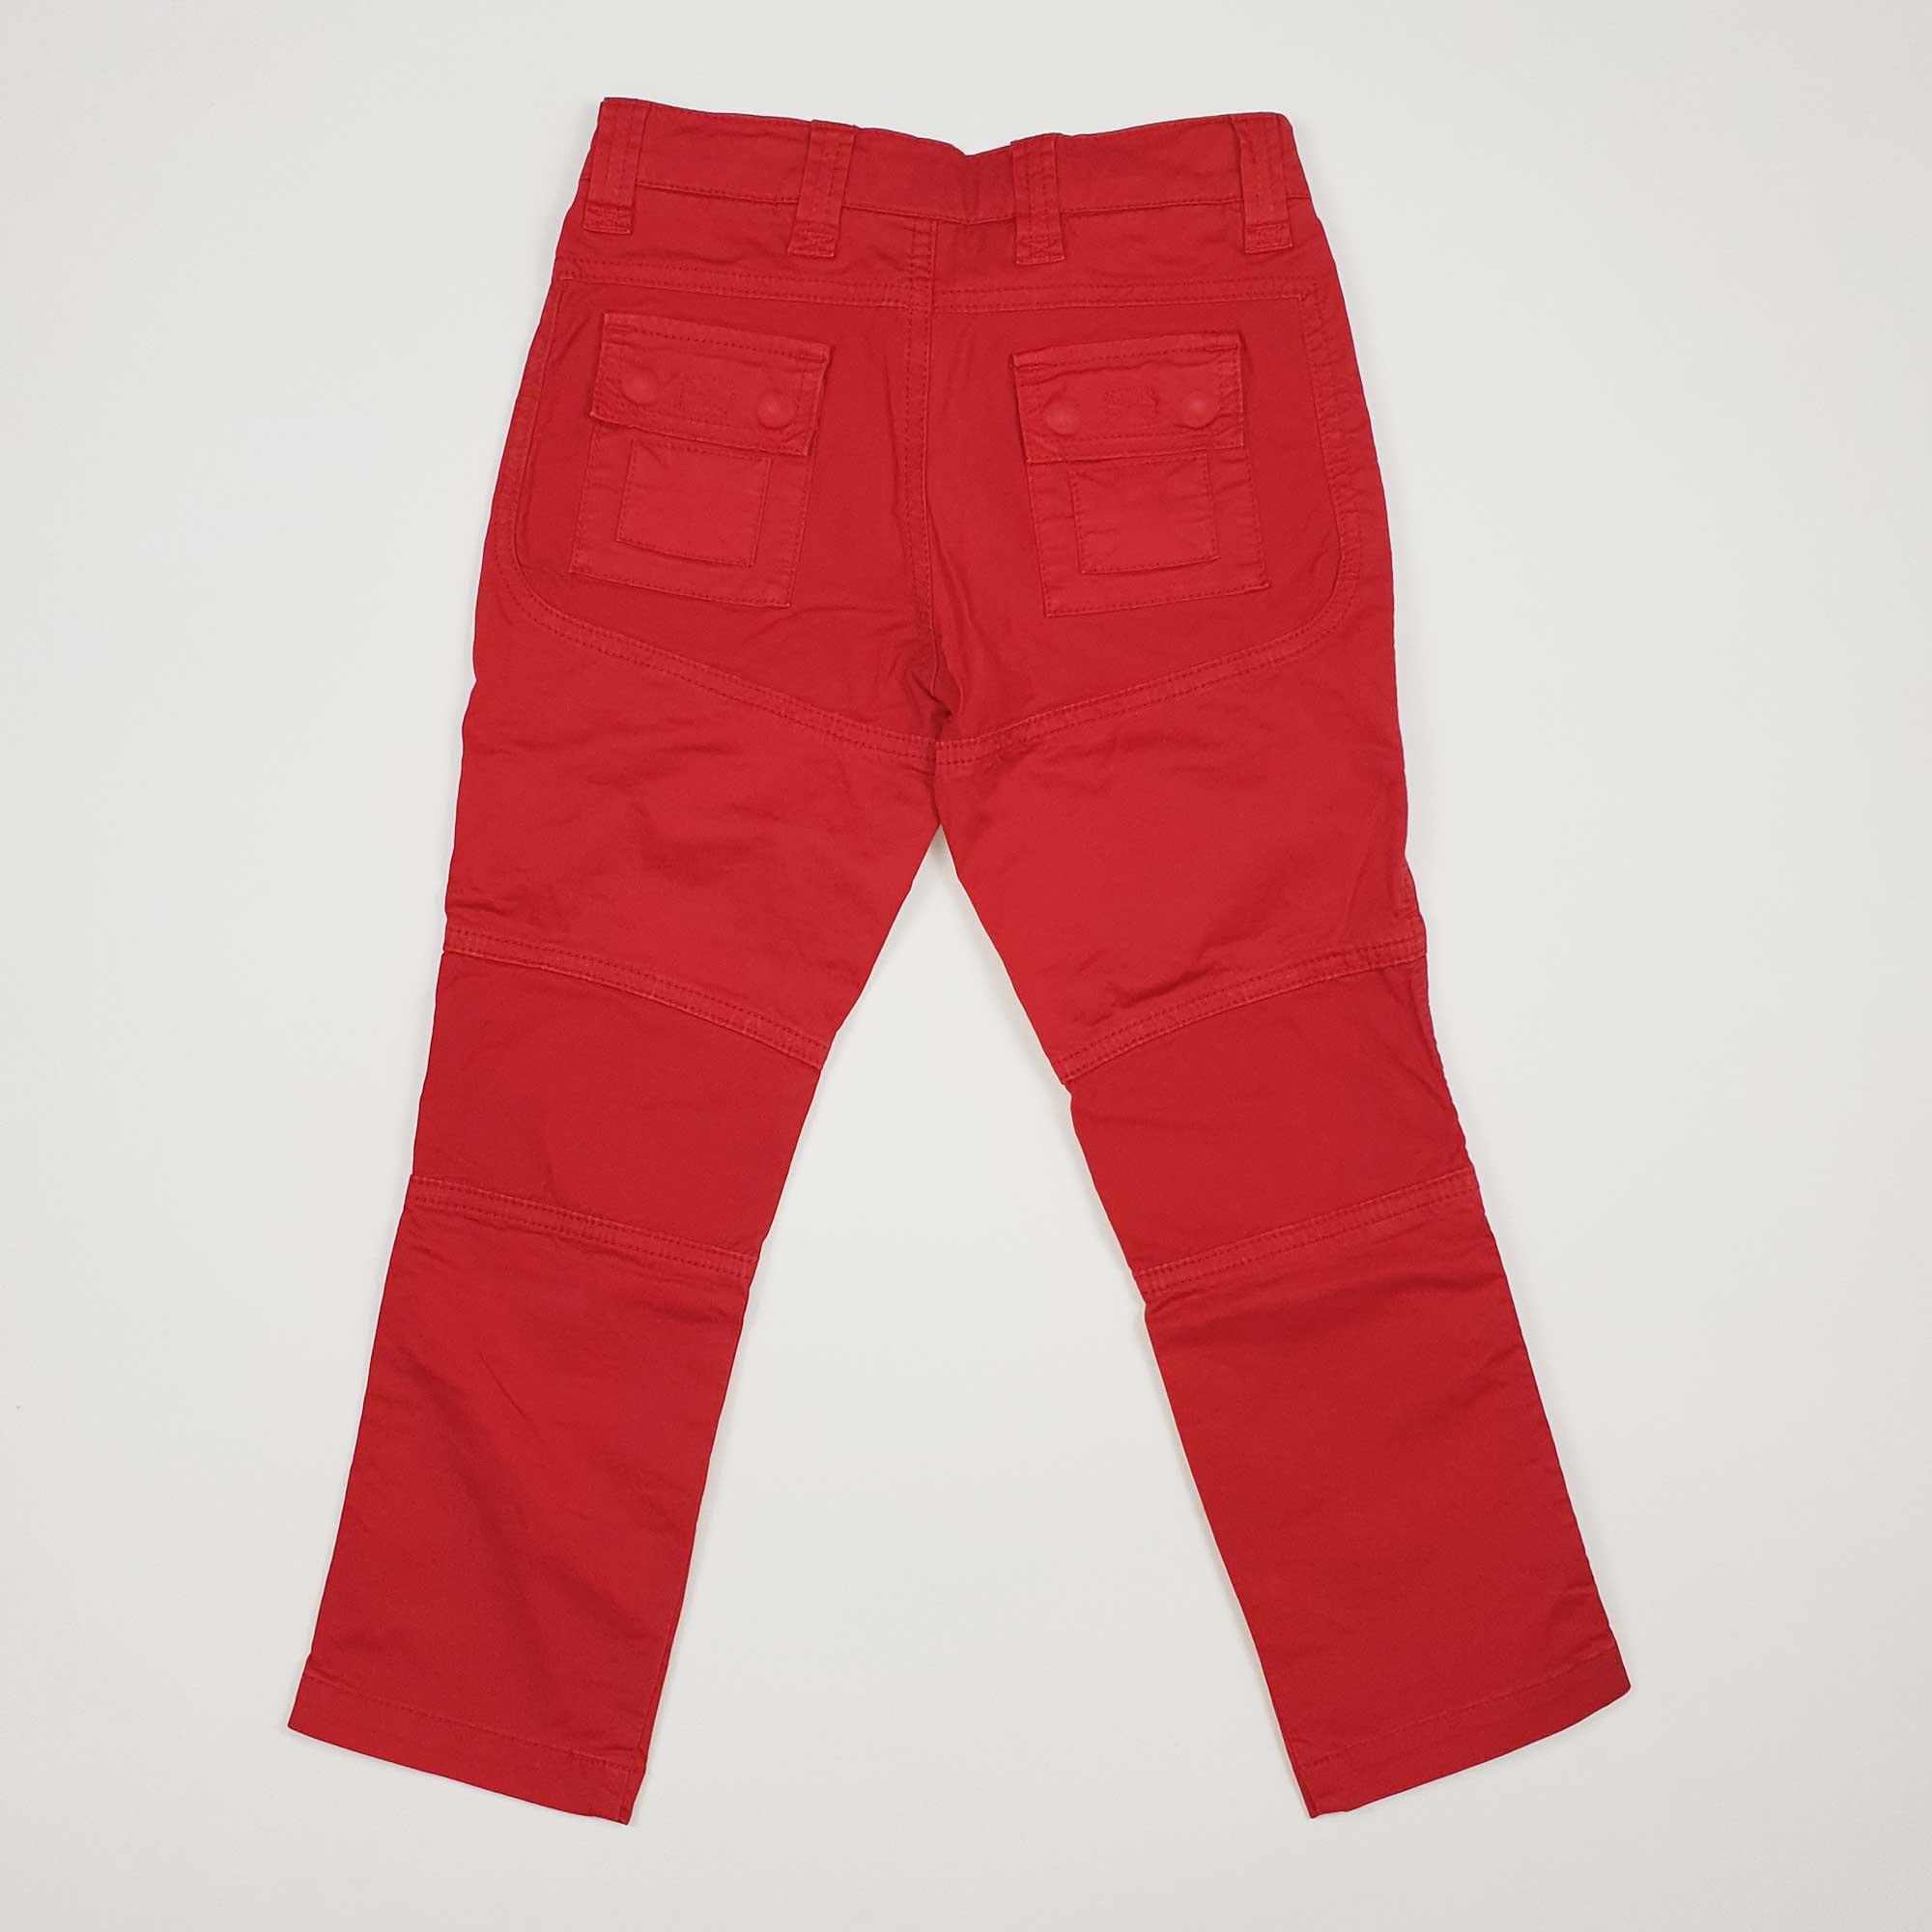 Pantalone anti-g - Rosso